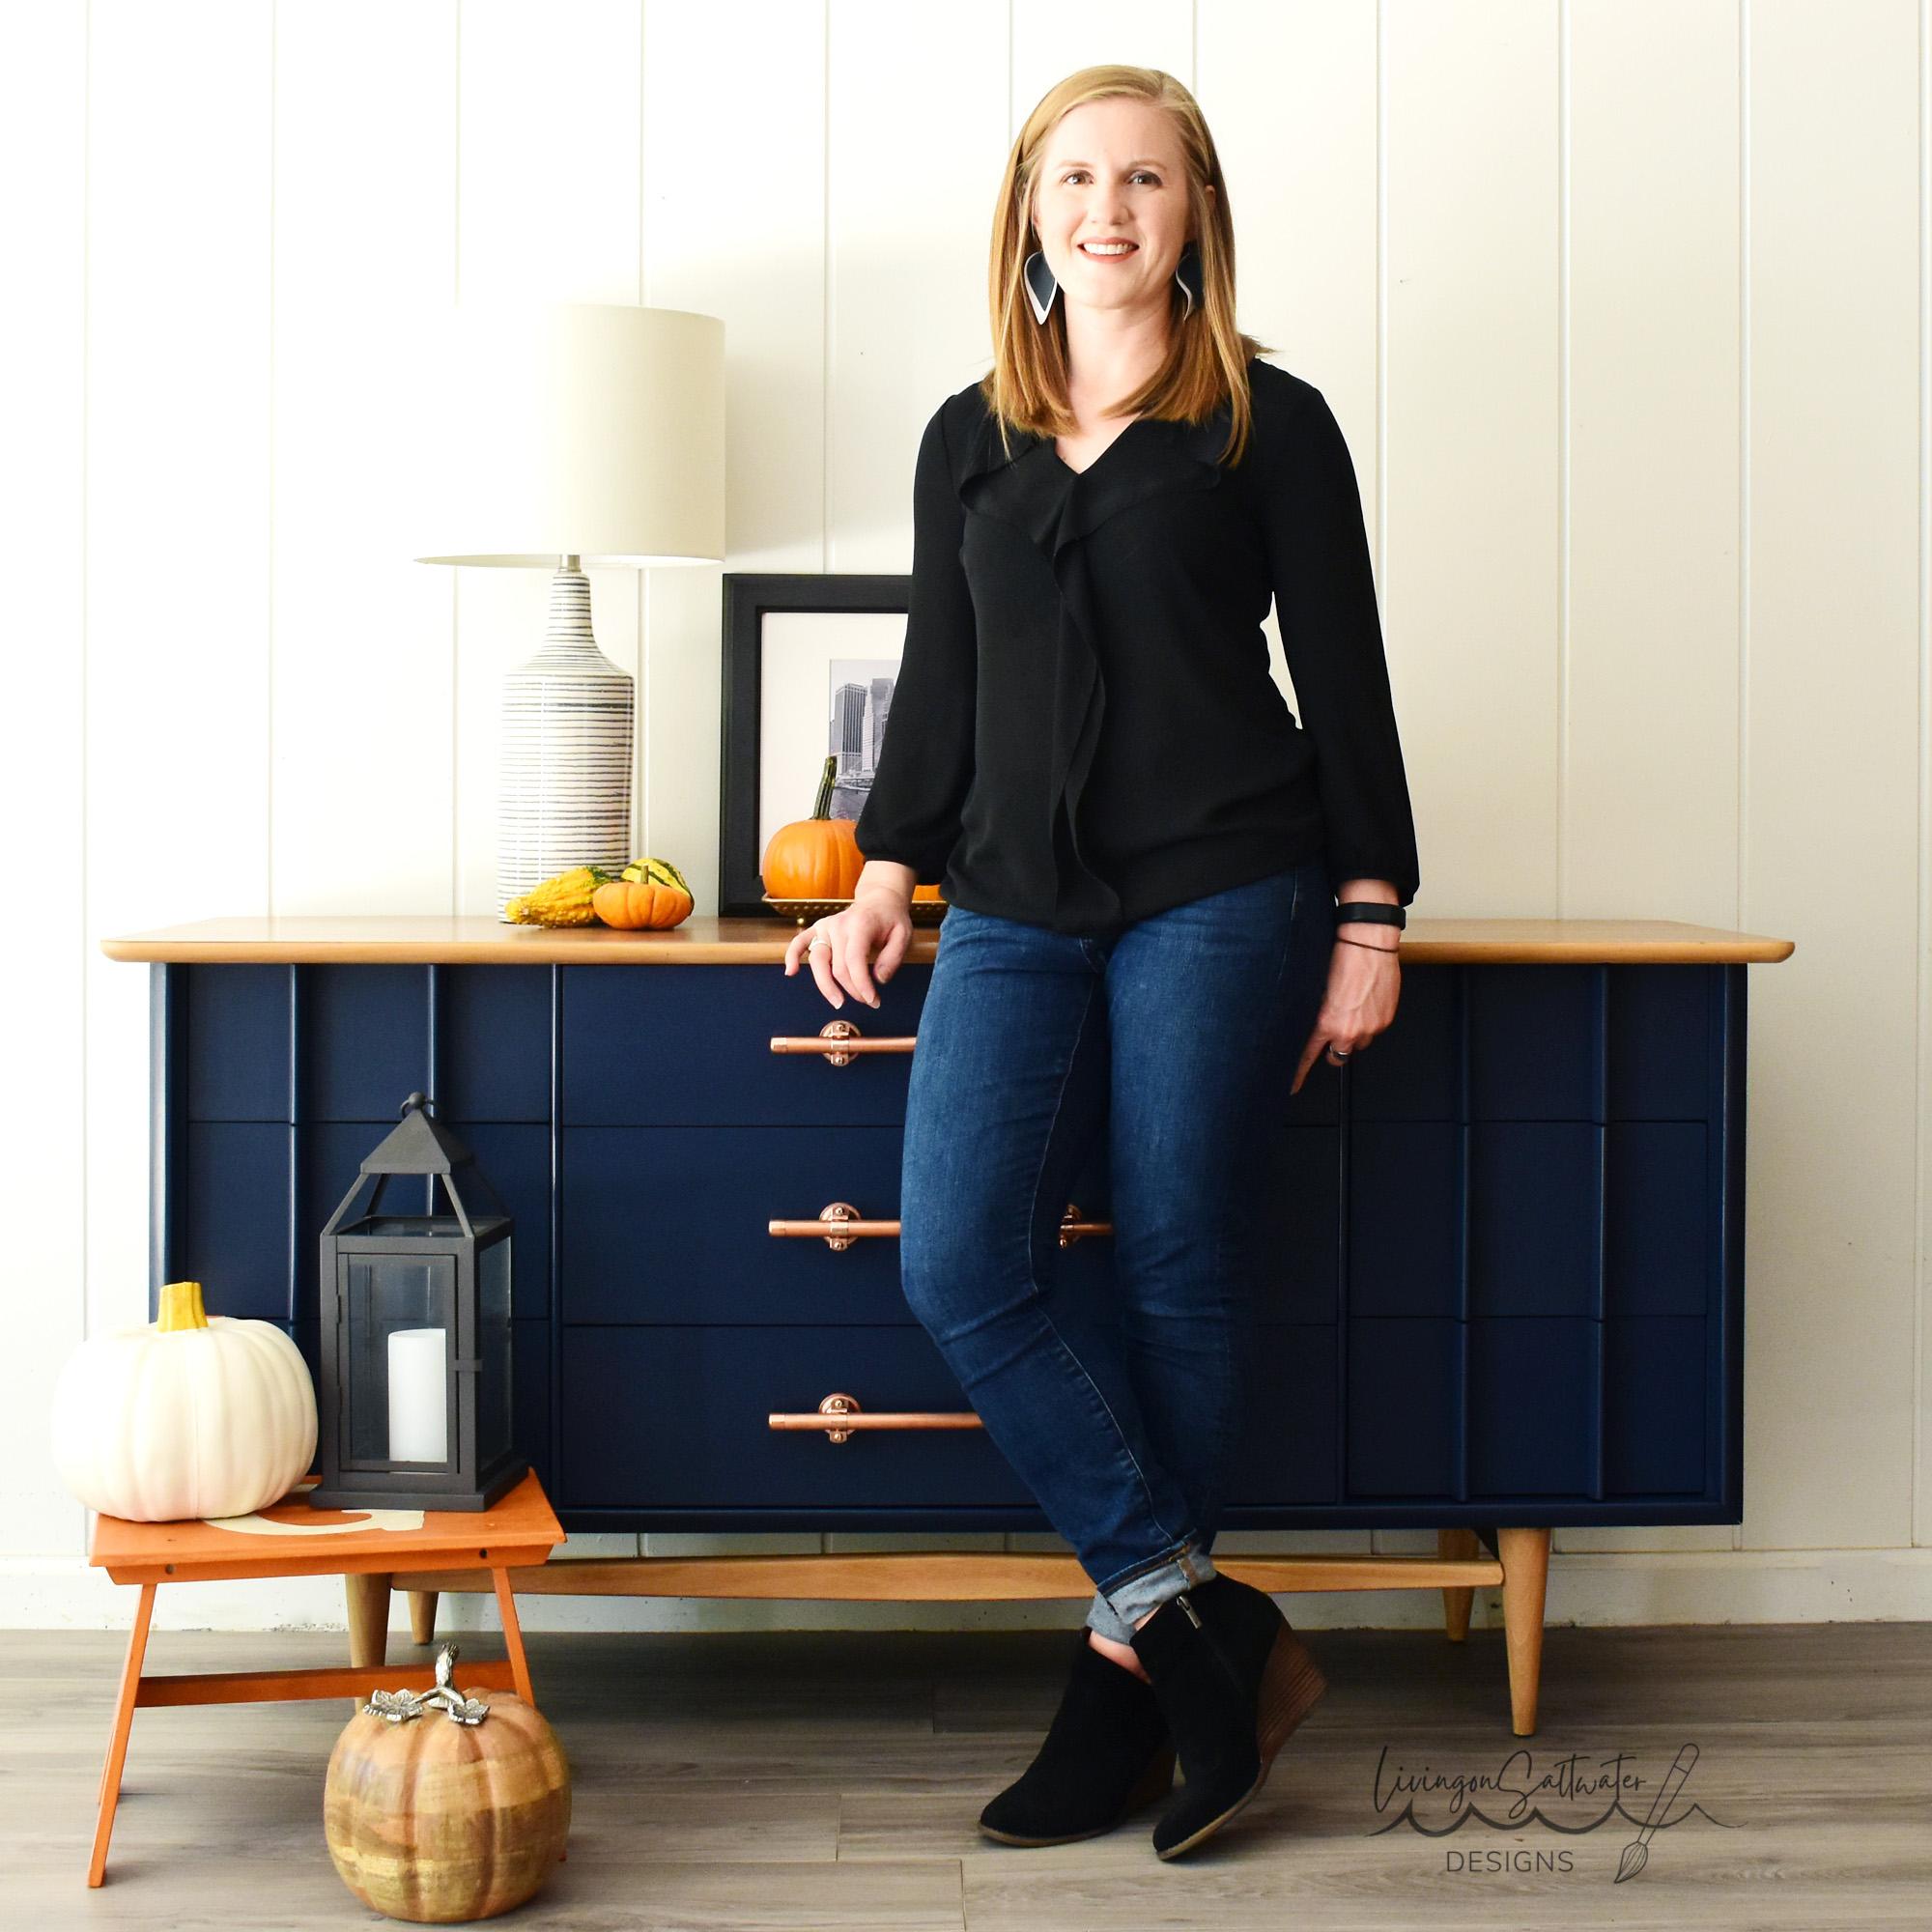 Meet Caroline, the woman behind LivingonSaltwater Designs